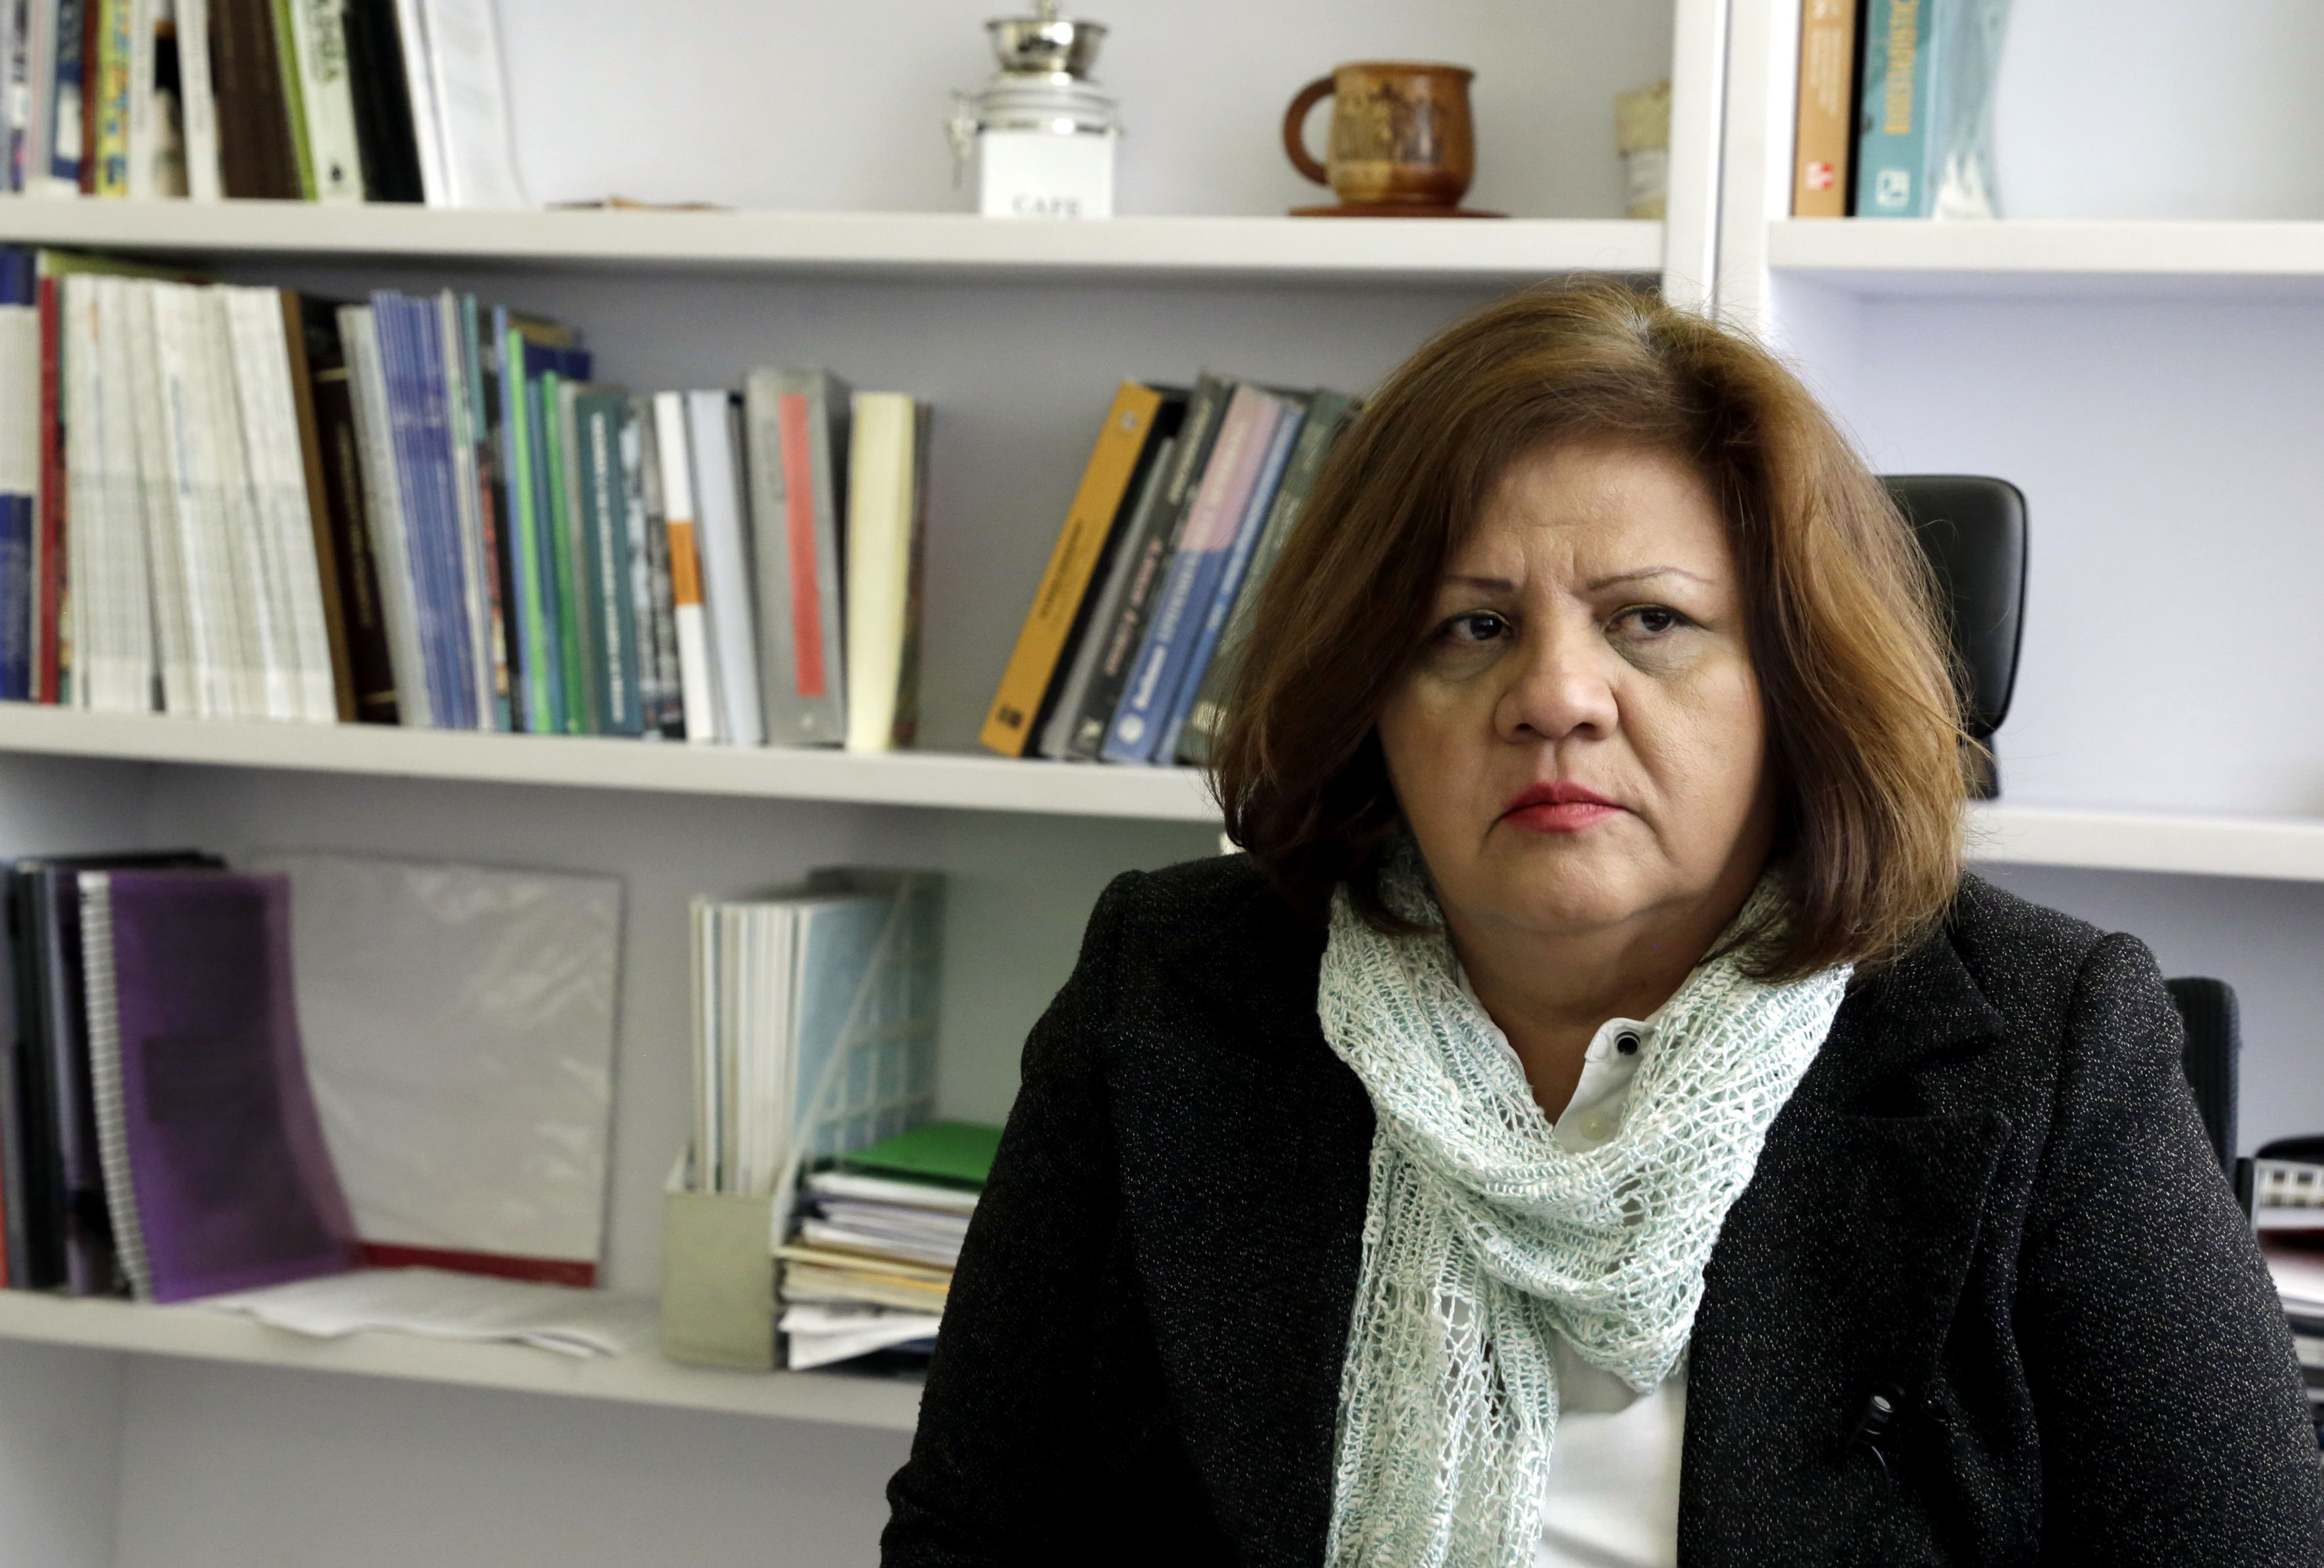 Dra. Genoveva Rizo, investigadora